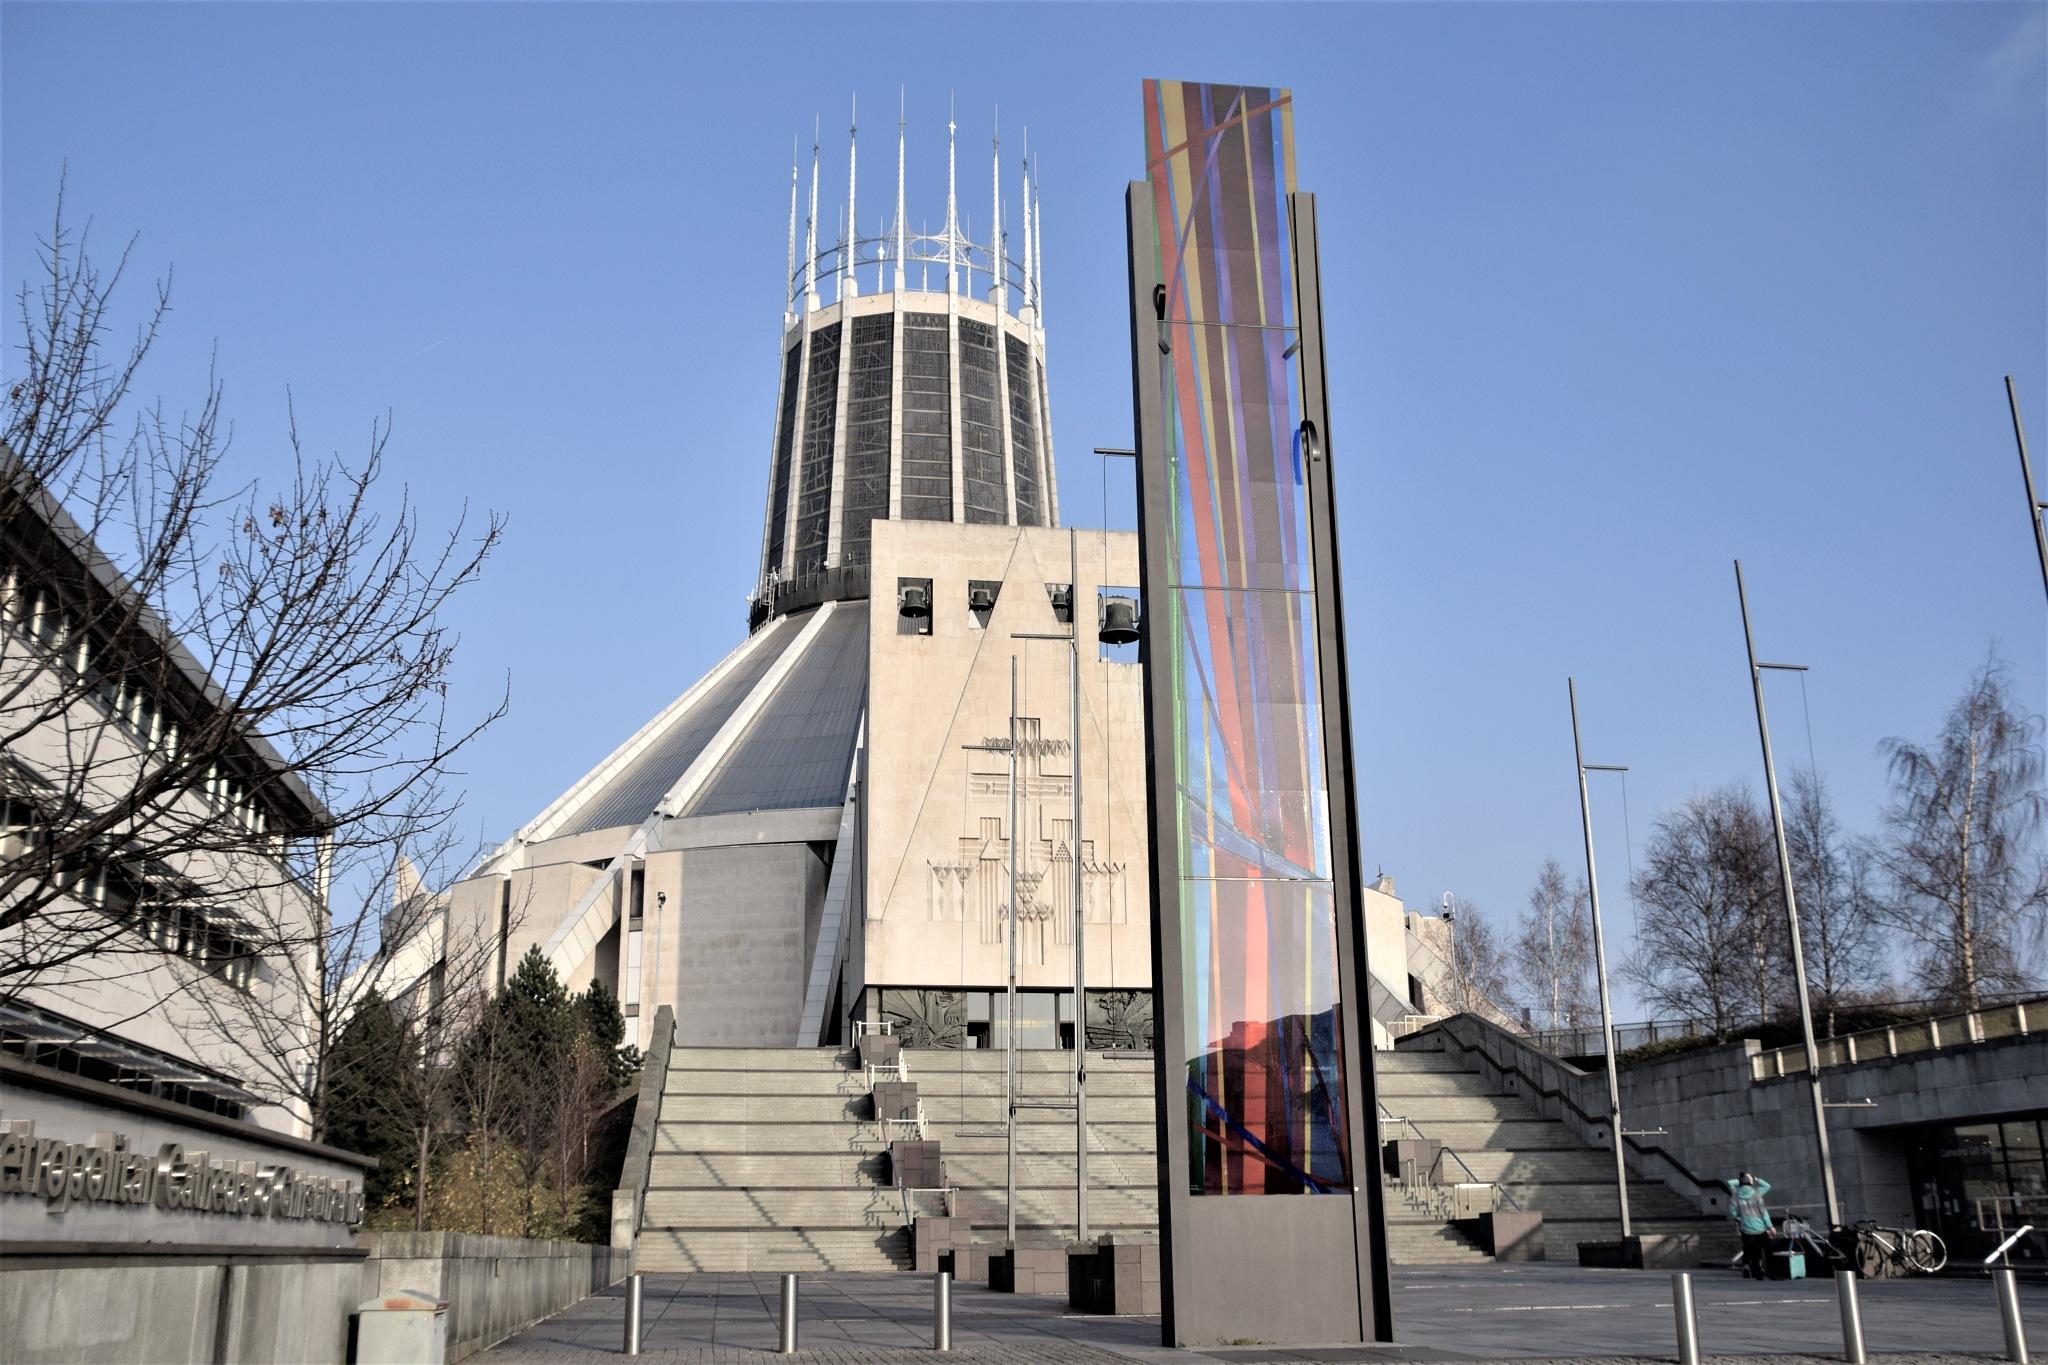 Liverpool metropolitan church  by cliff.edmundson.3